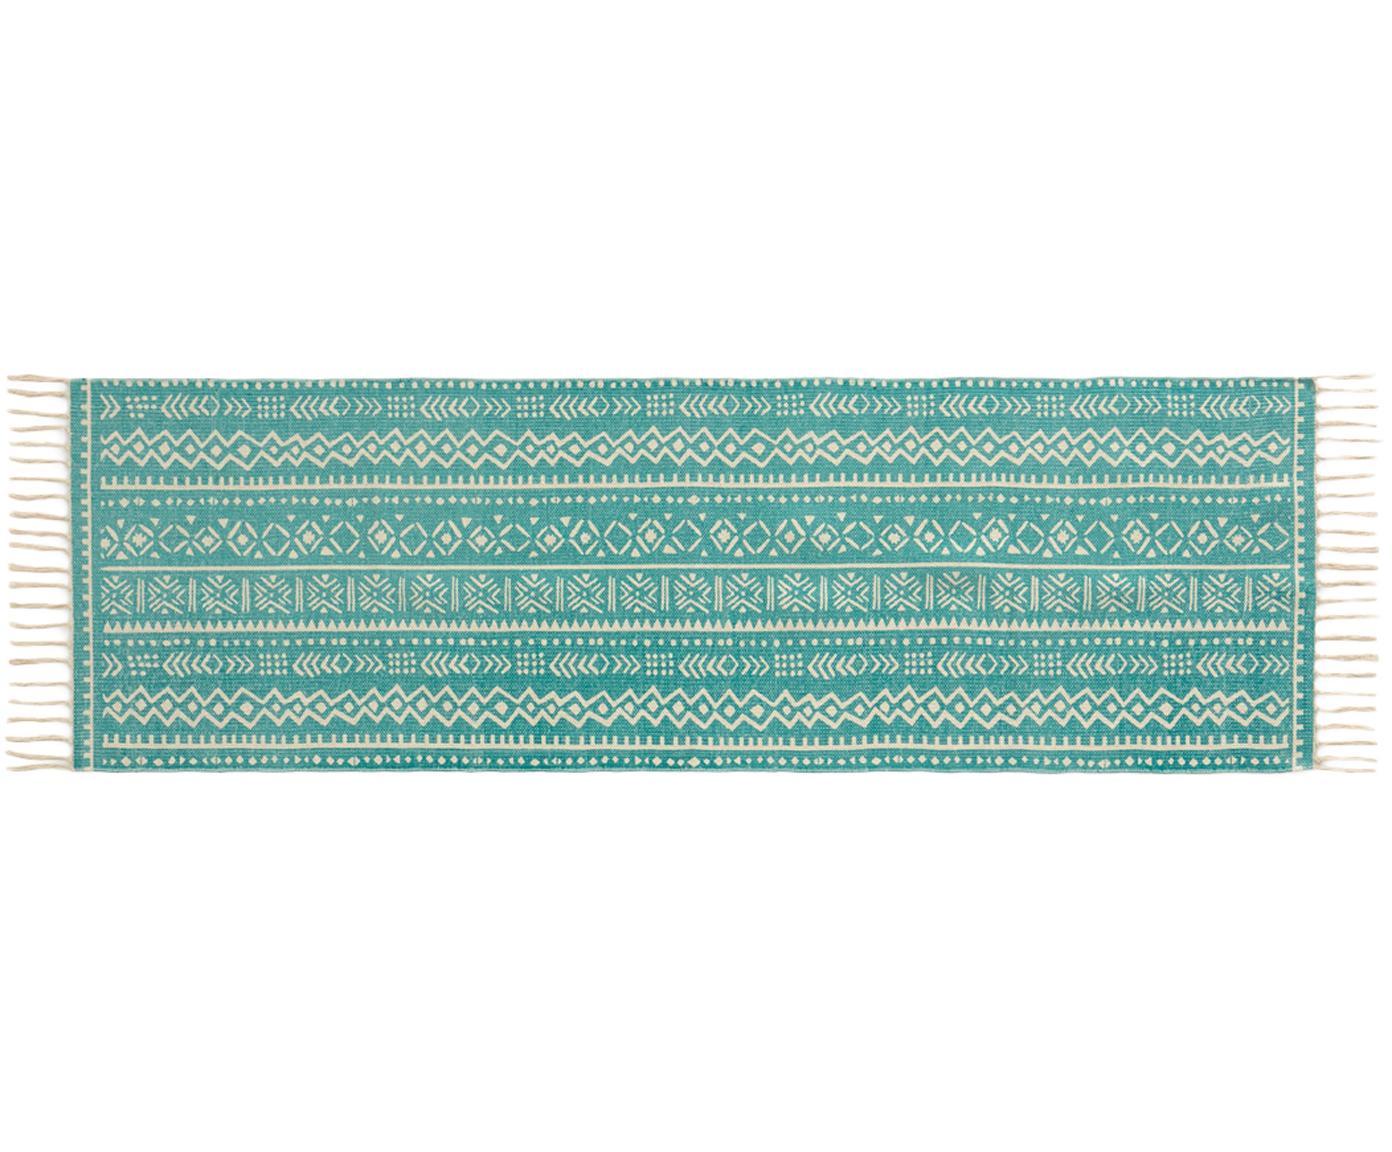 Alfombra Afra, Algodón, Turquesa, blanco crudo, An 60 x L 190 cm